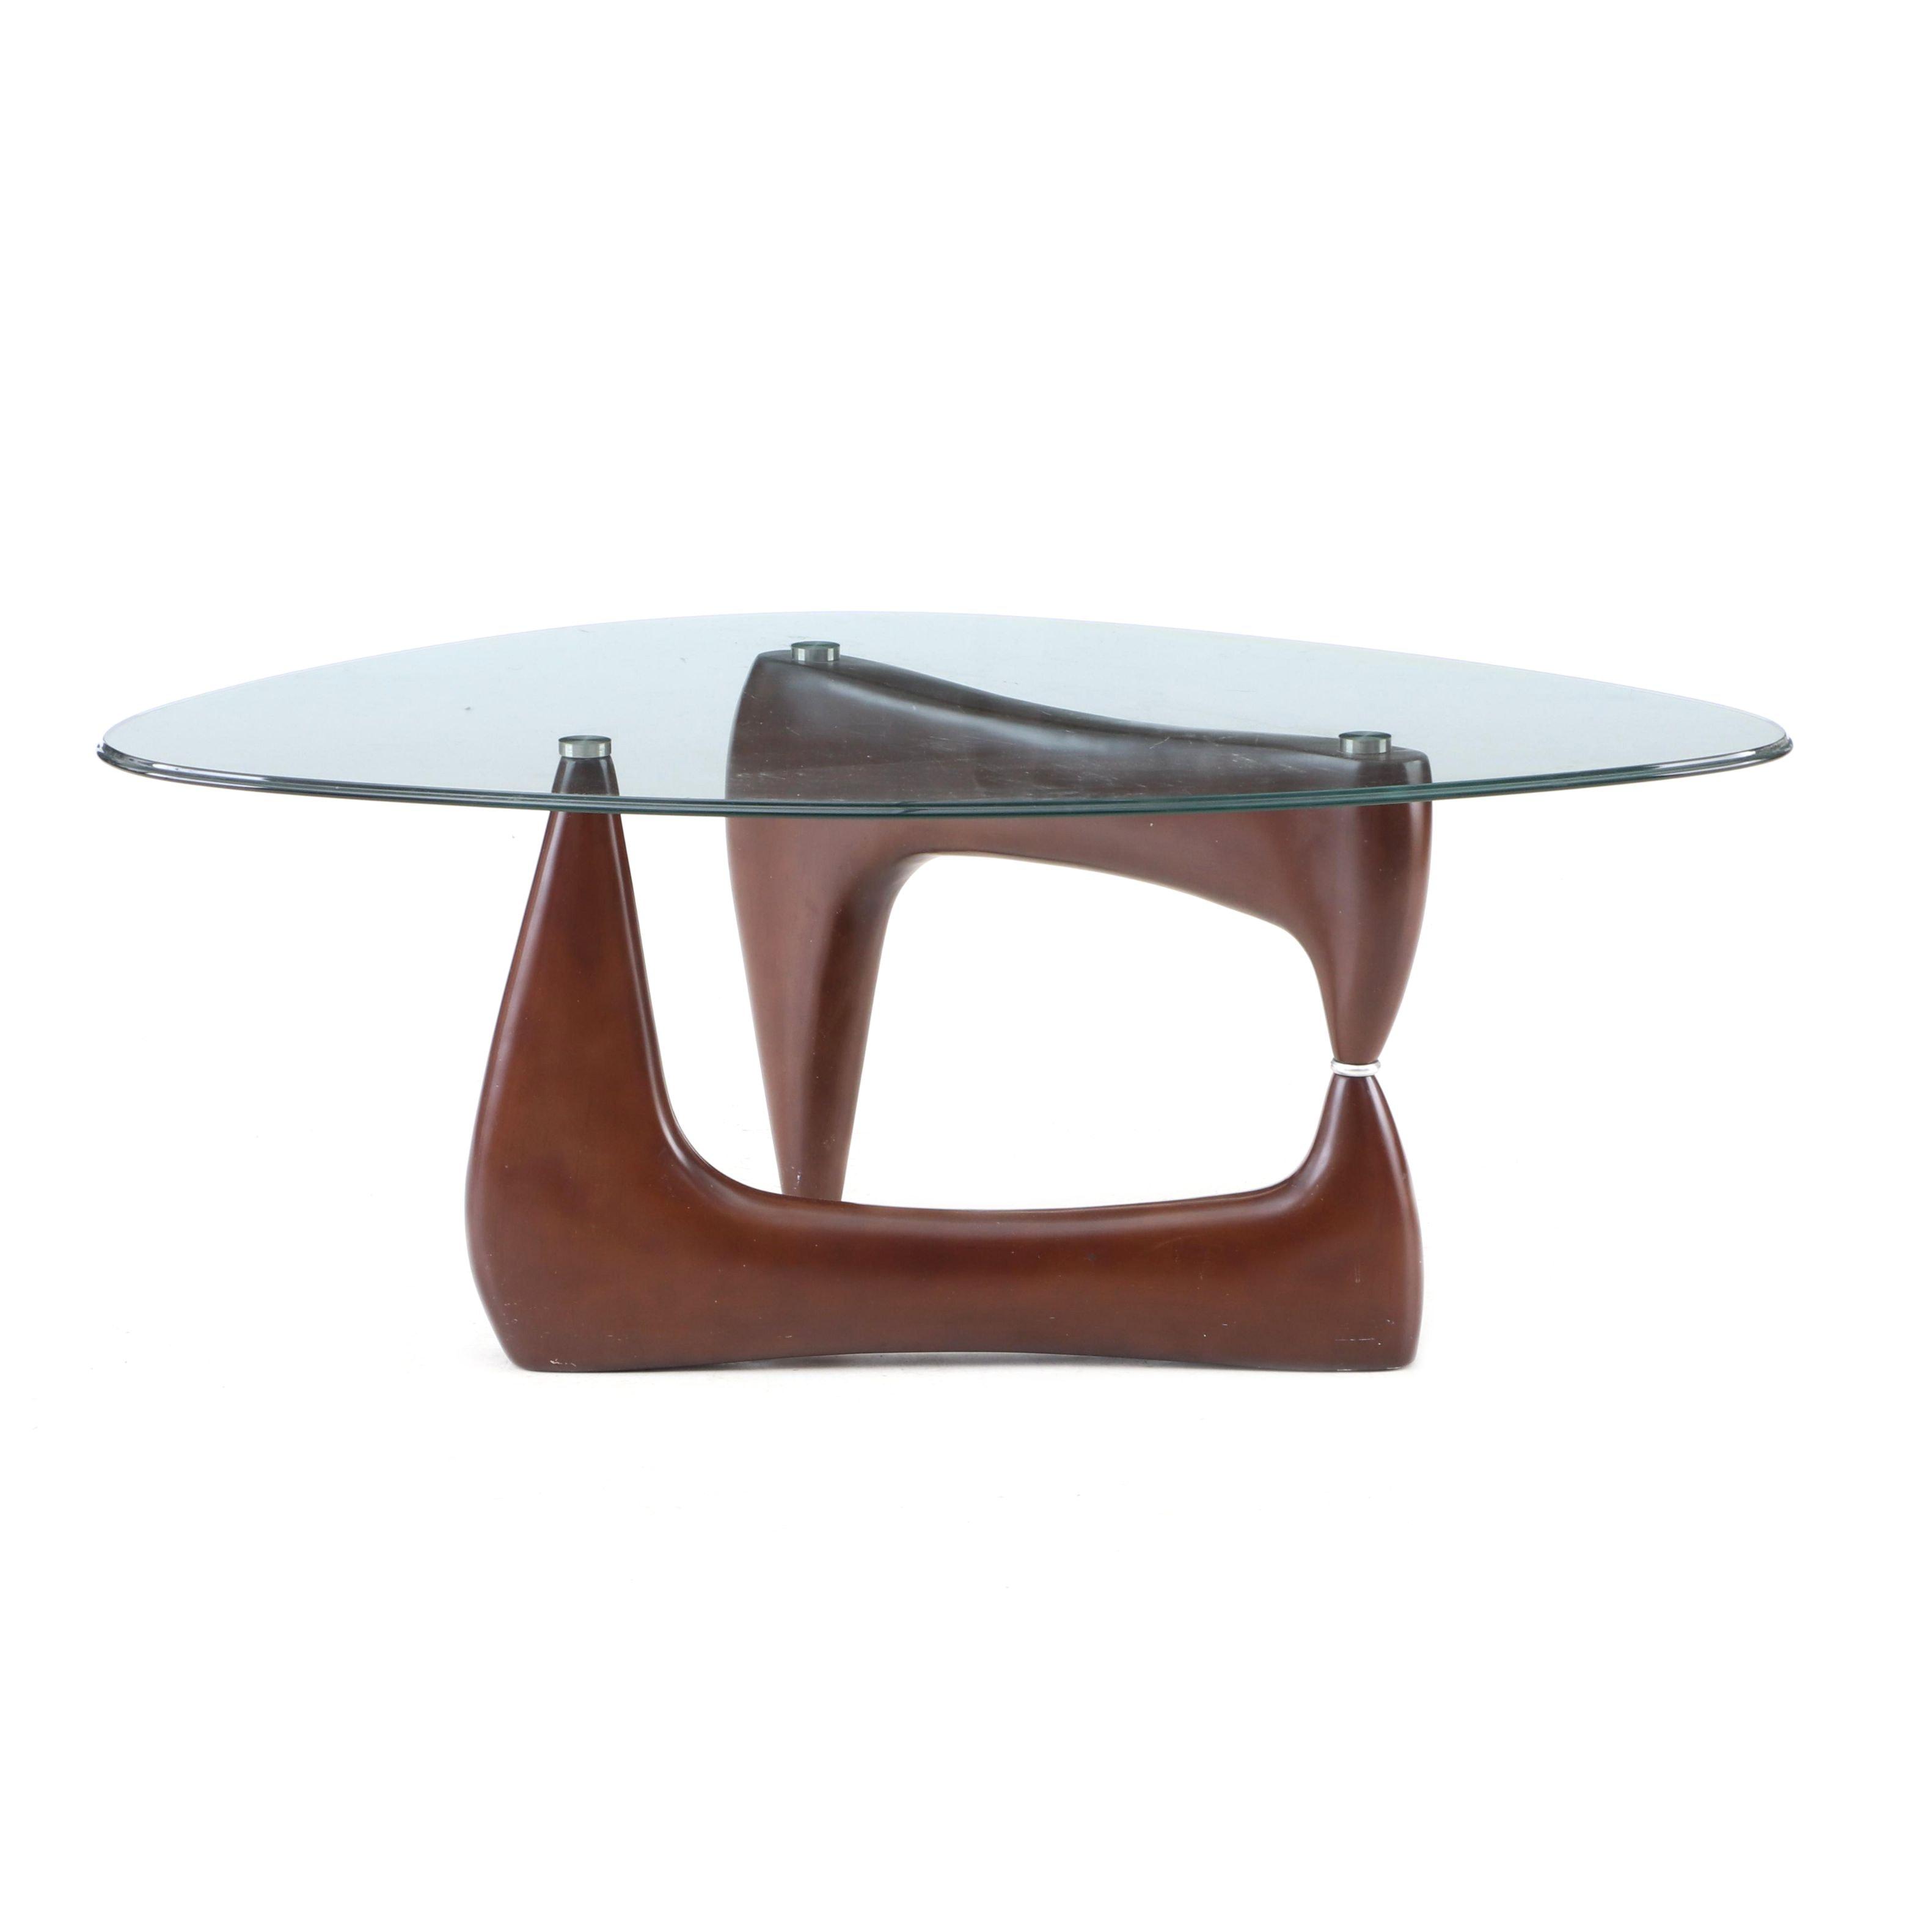 Isamu Noguchi Style Coffee Table, 20th Century